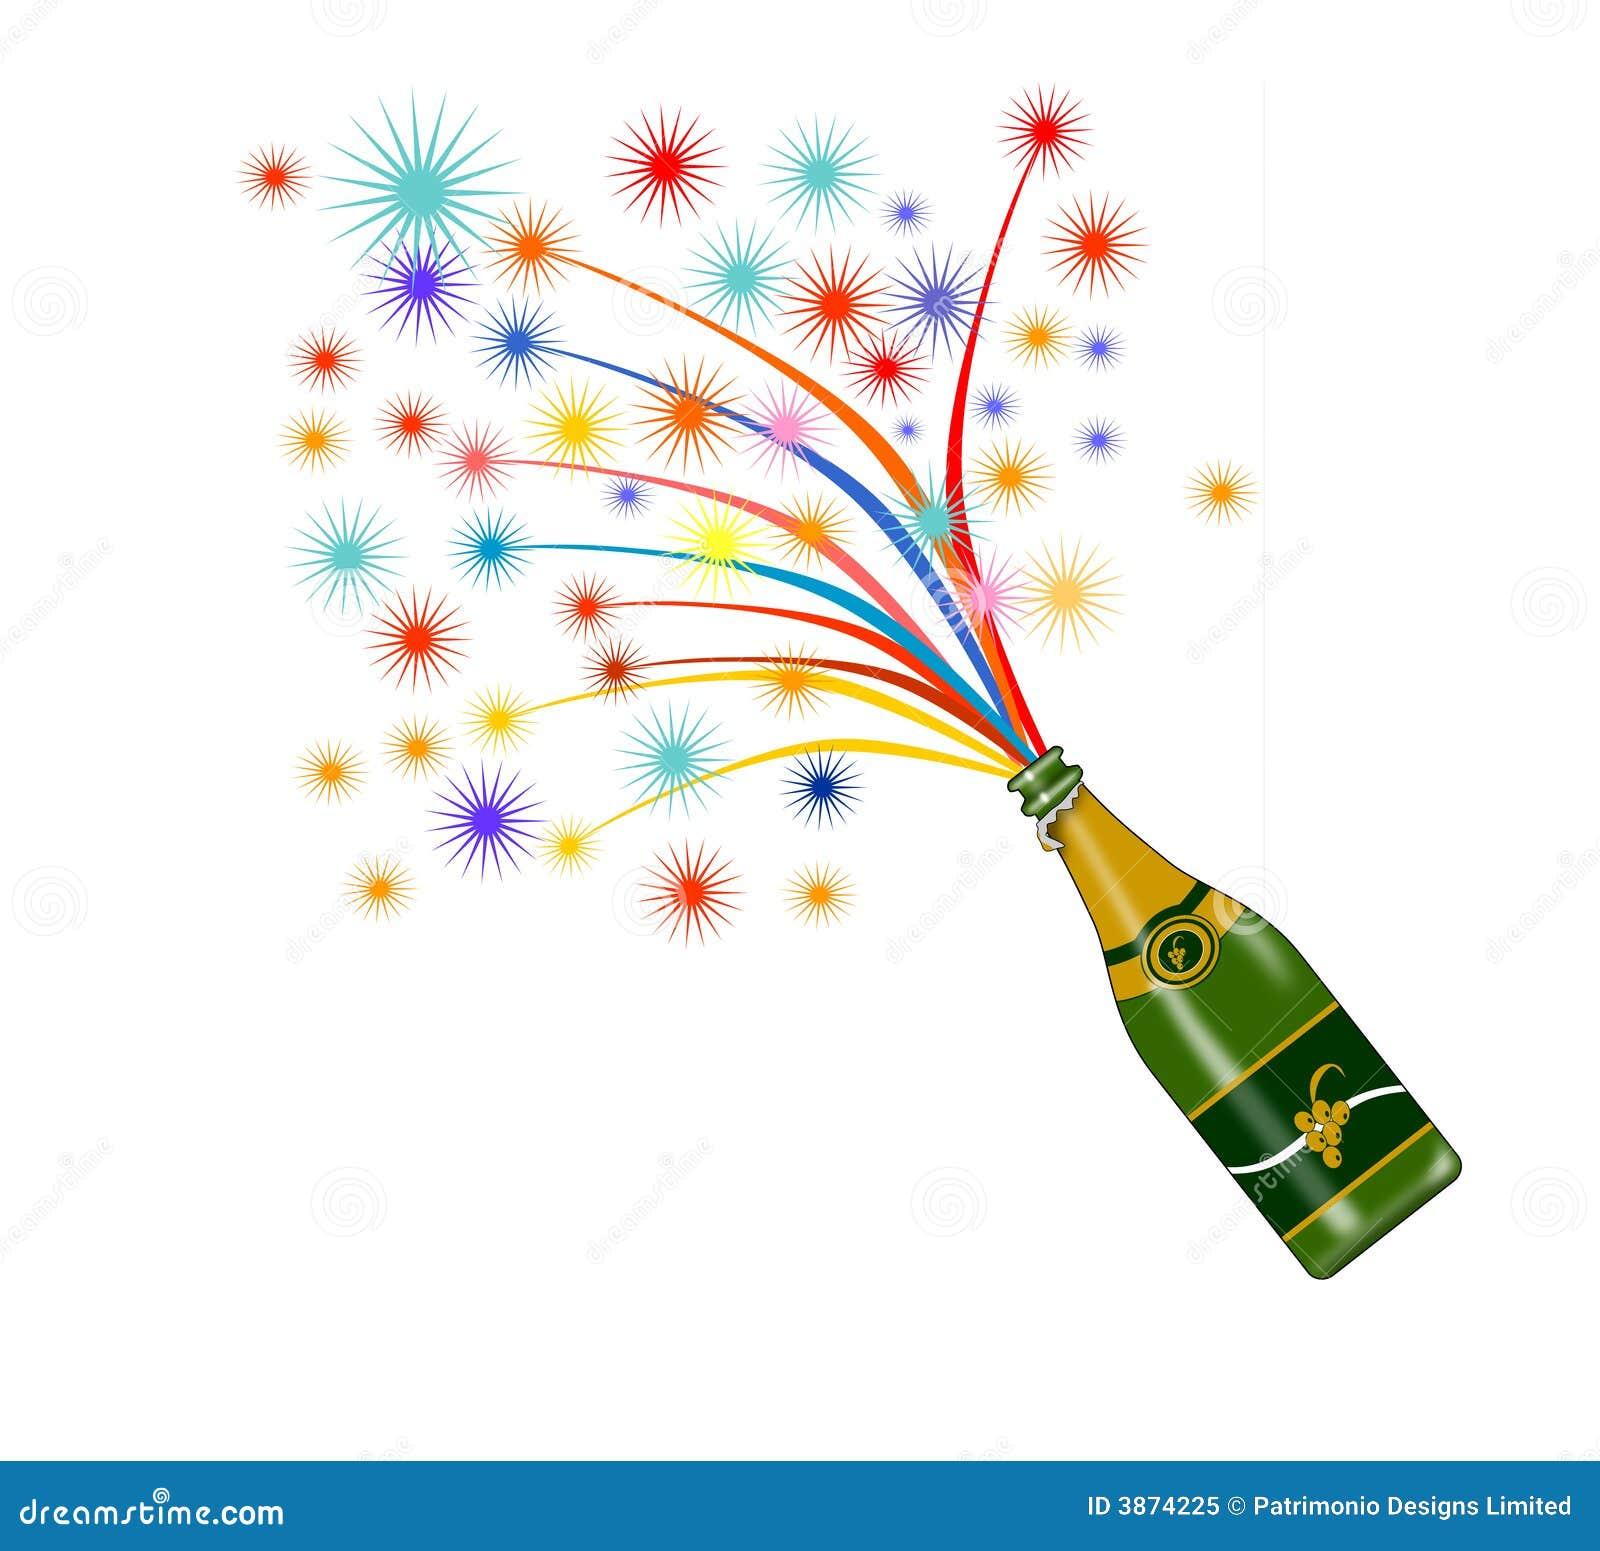 Wine Bottle With Fireworks Royalty Free Stock Photo - Image: 3874225